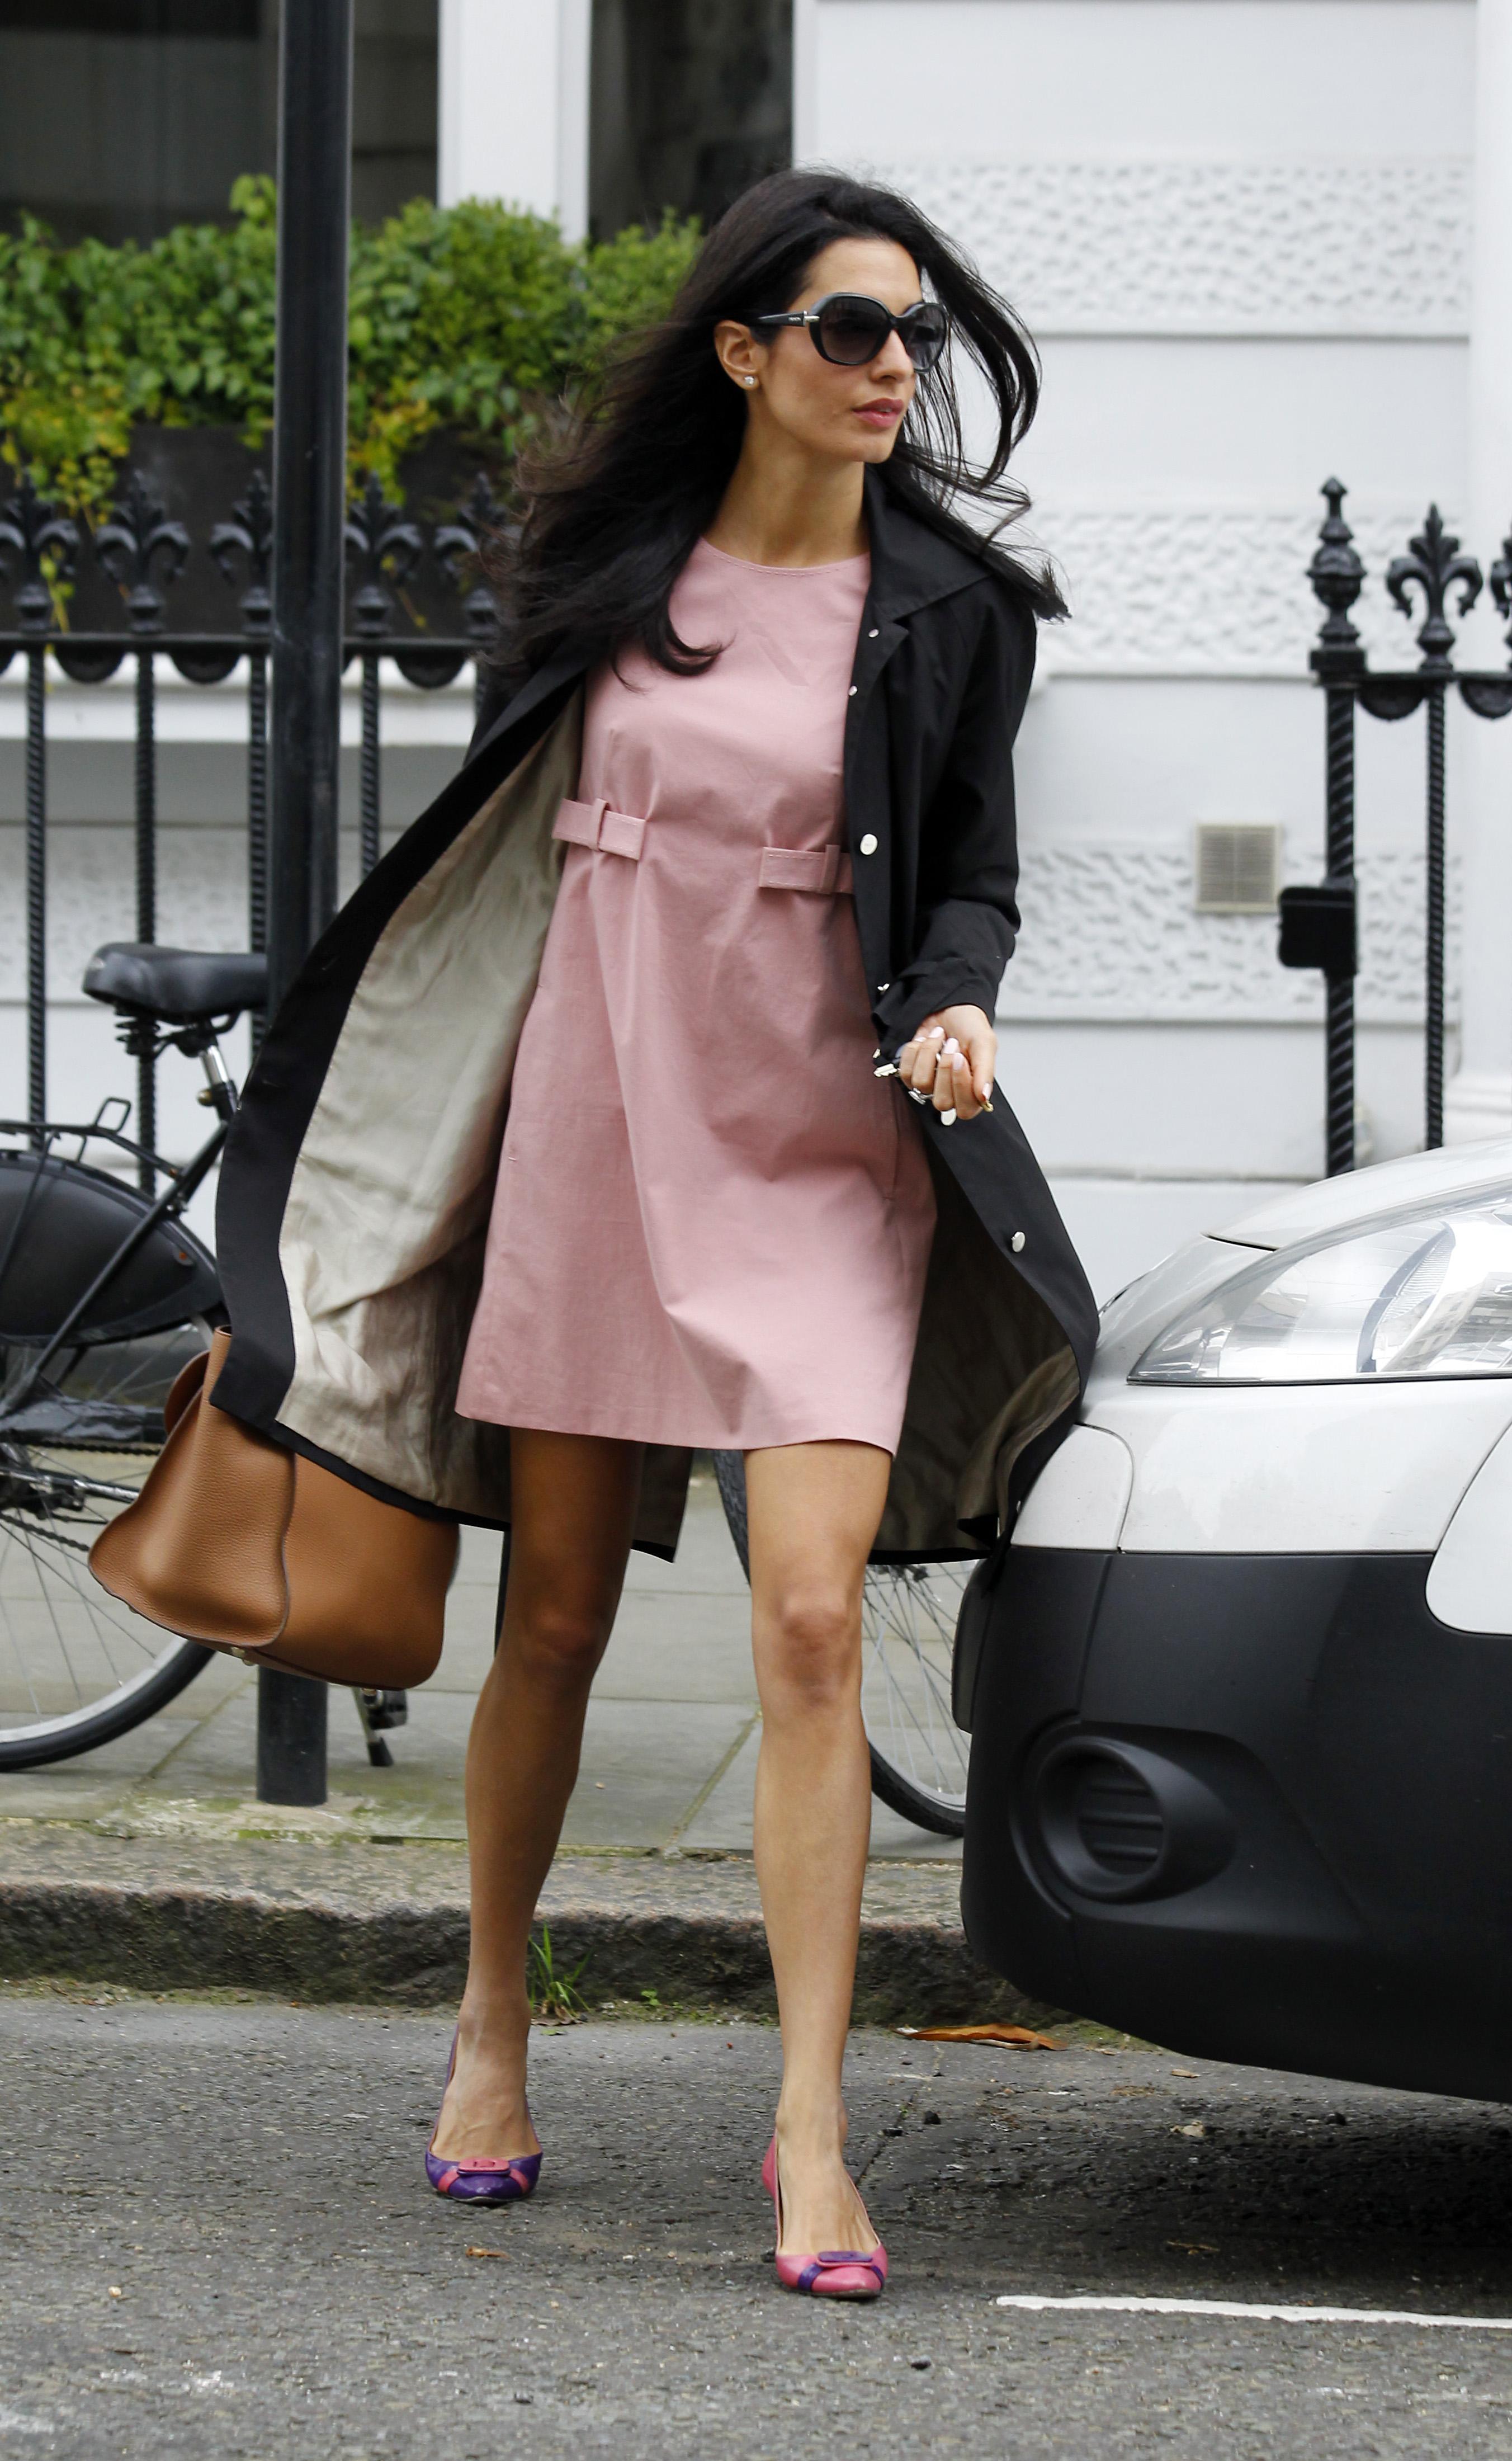 Le dress code working girl de Amal Alamuddin Clooney ... алессандра амбросио